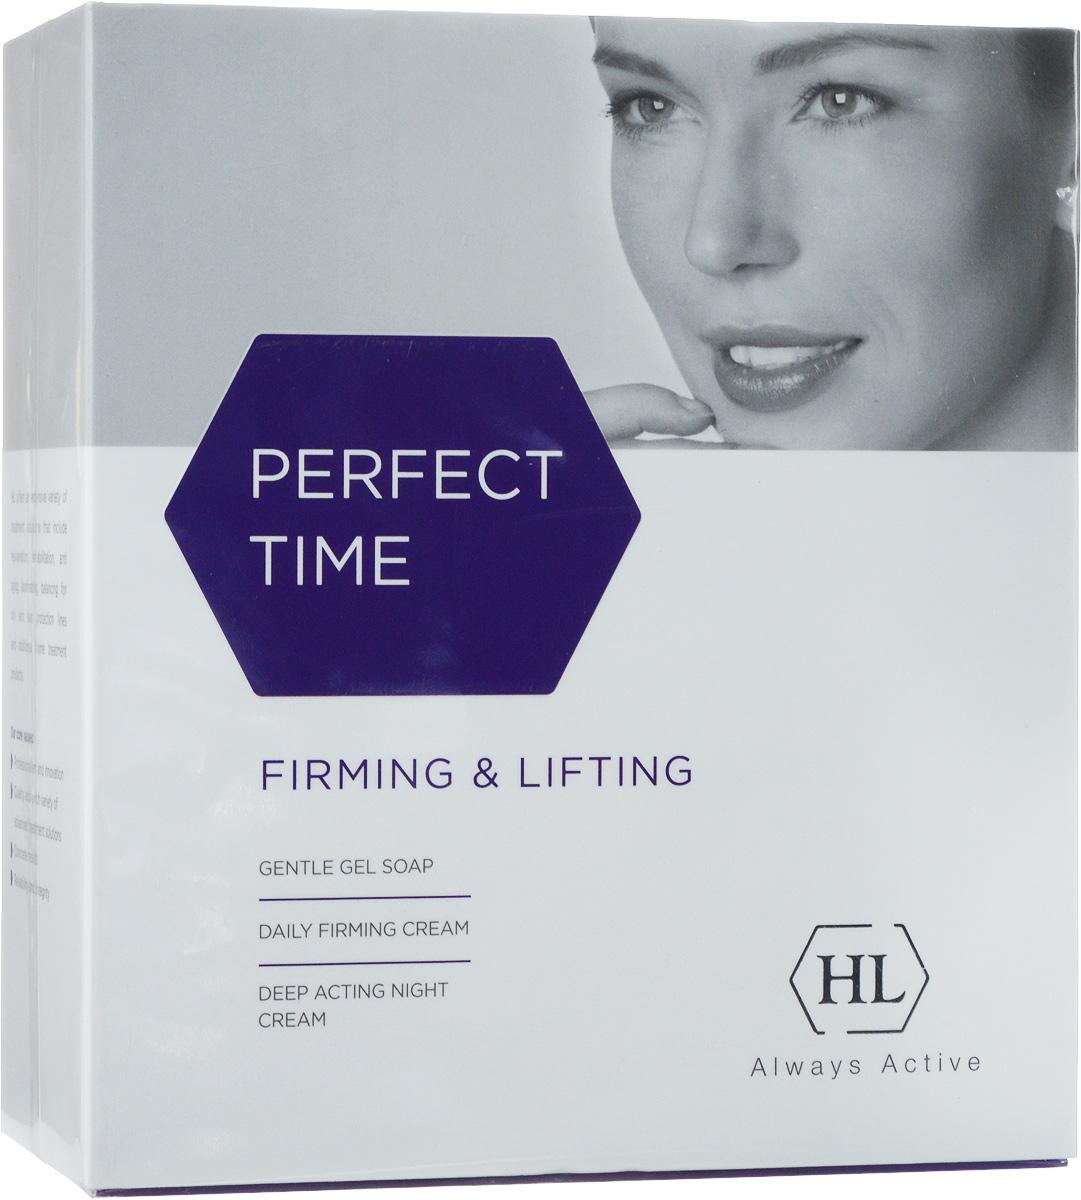 Holy Land Набор для укрепления и лифтинг кожи лица Perfect Time Perfect Time Kit, (3 препарата) holy land perfect time advanced firm